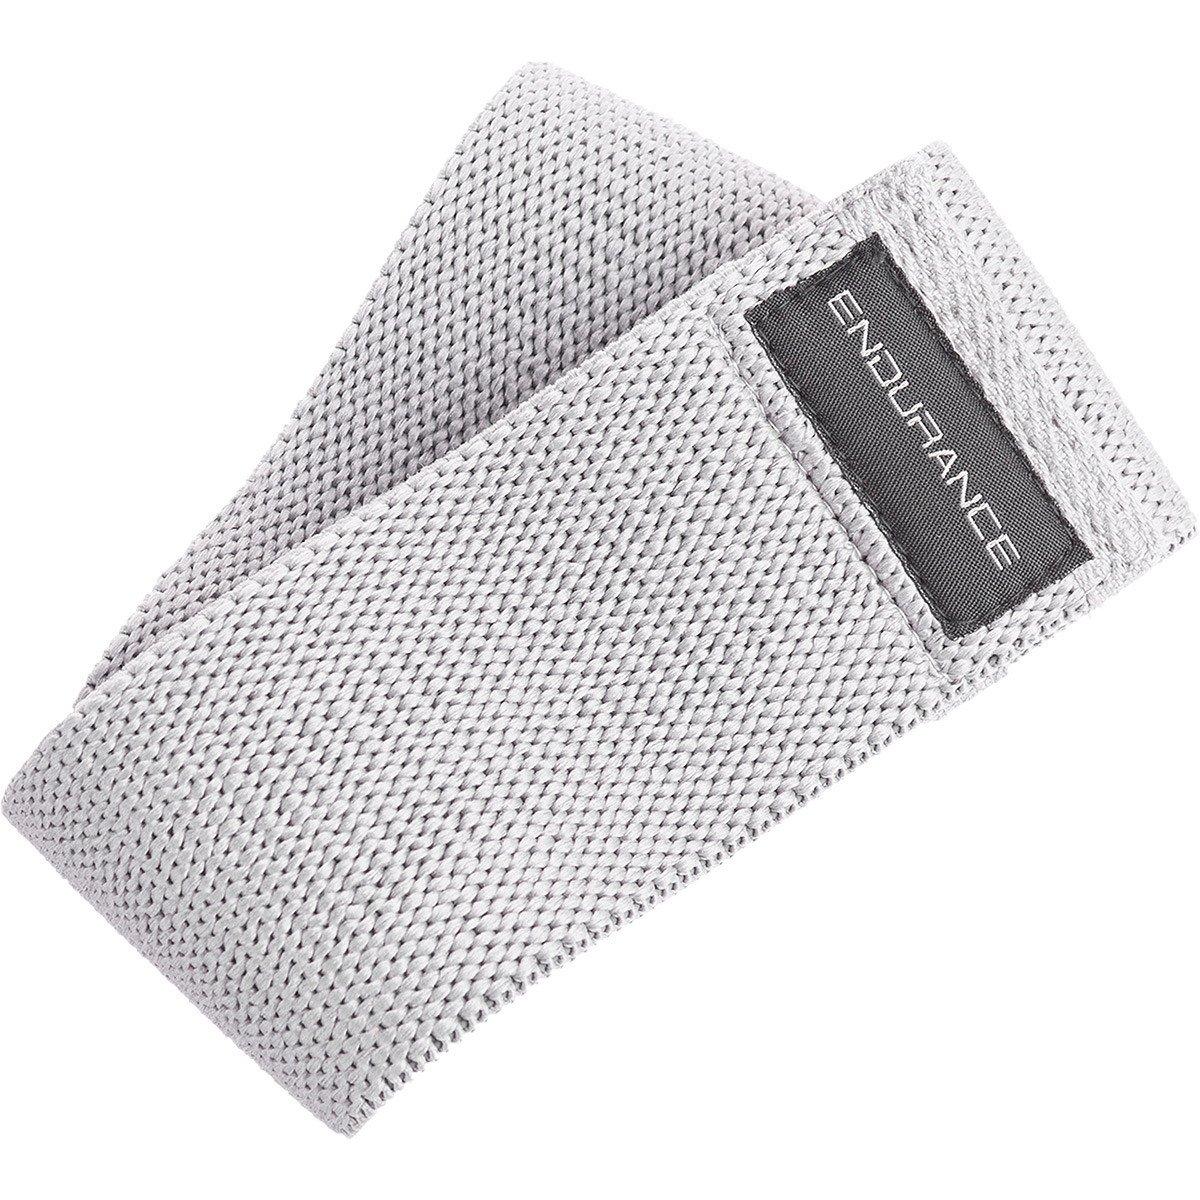 Endurance Tekstil Power Band - Medium